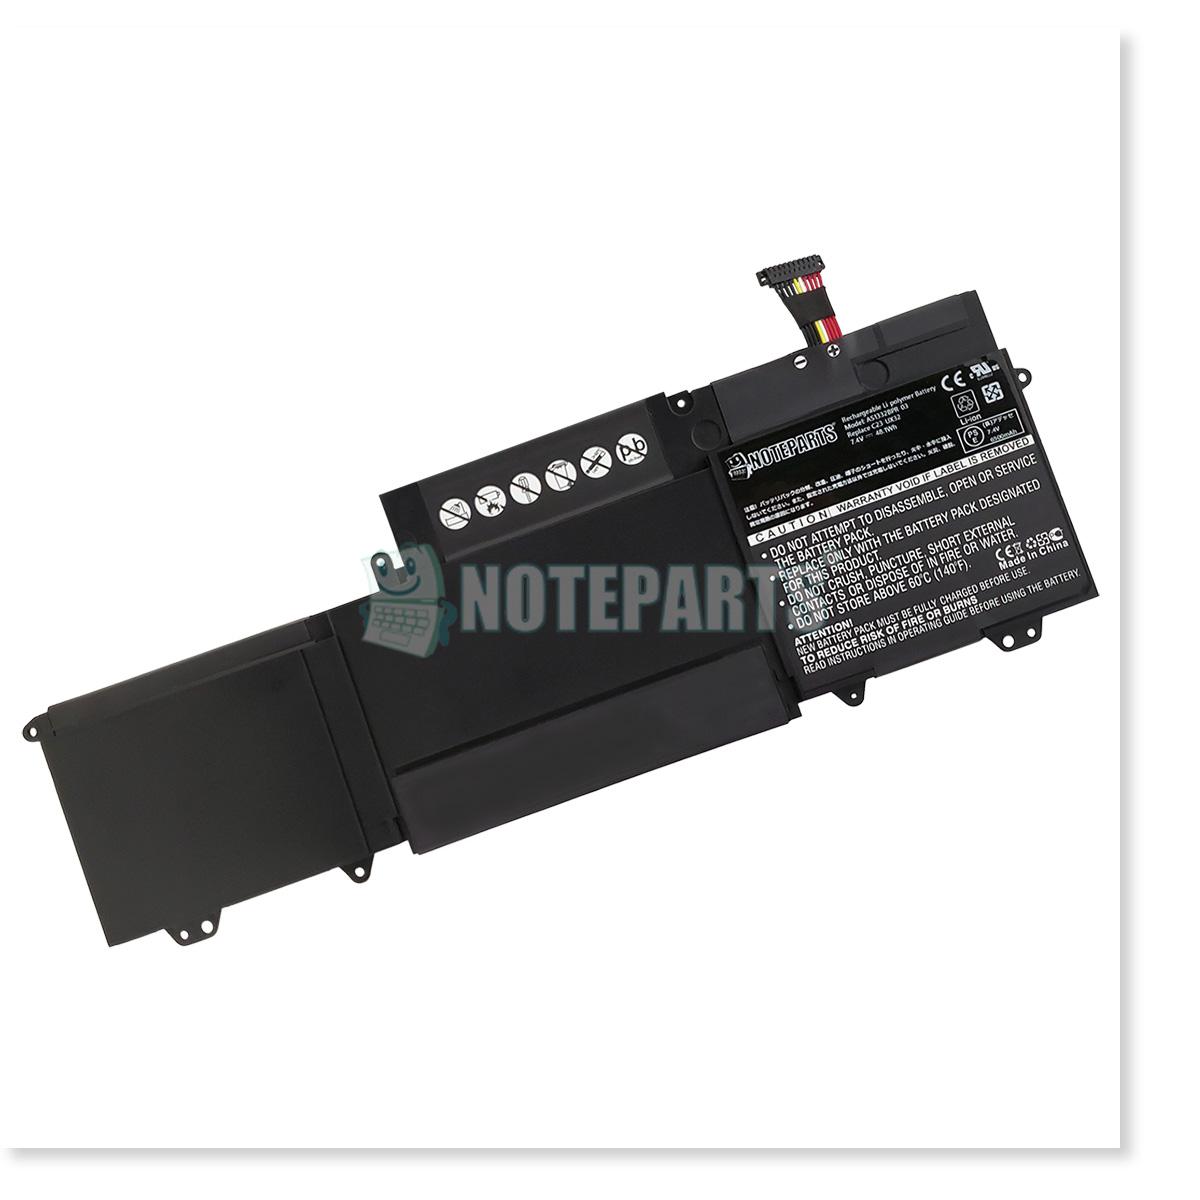 Asus ZENBOOK UX32A UX32VD ViVoBook U38N バッテリー C23-UX32対応